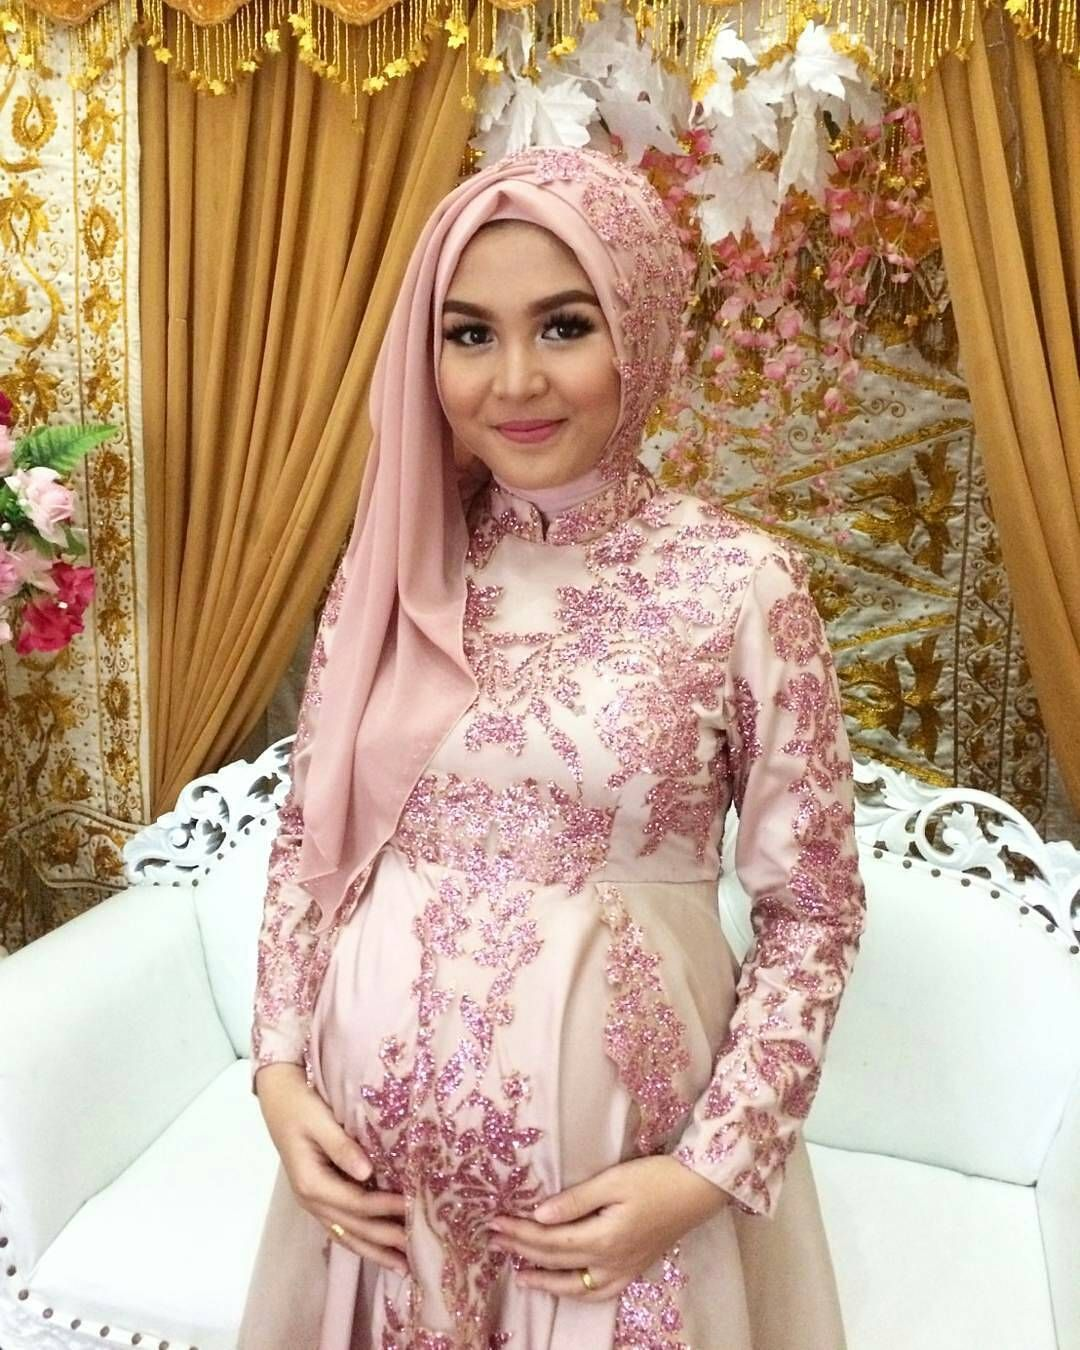 Pin de ida adam en Pregnant muslimah dresses | Pinterest | Vestidos ...